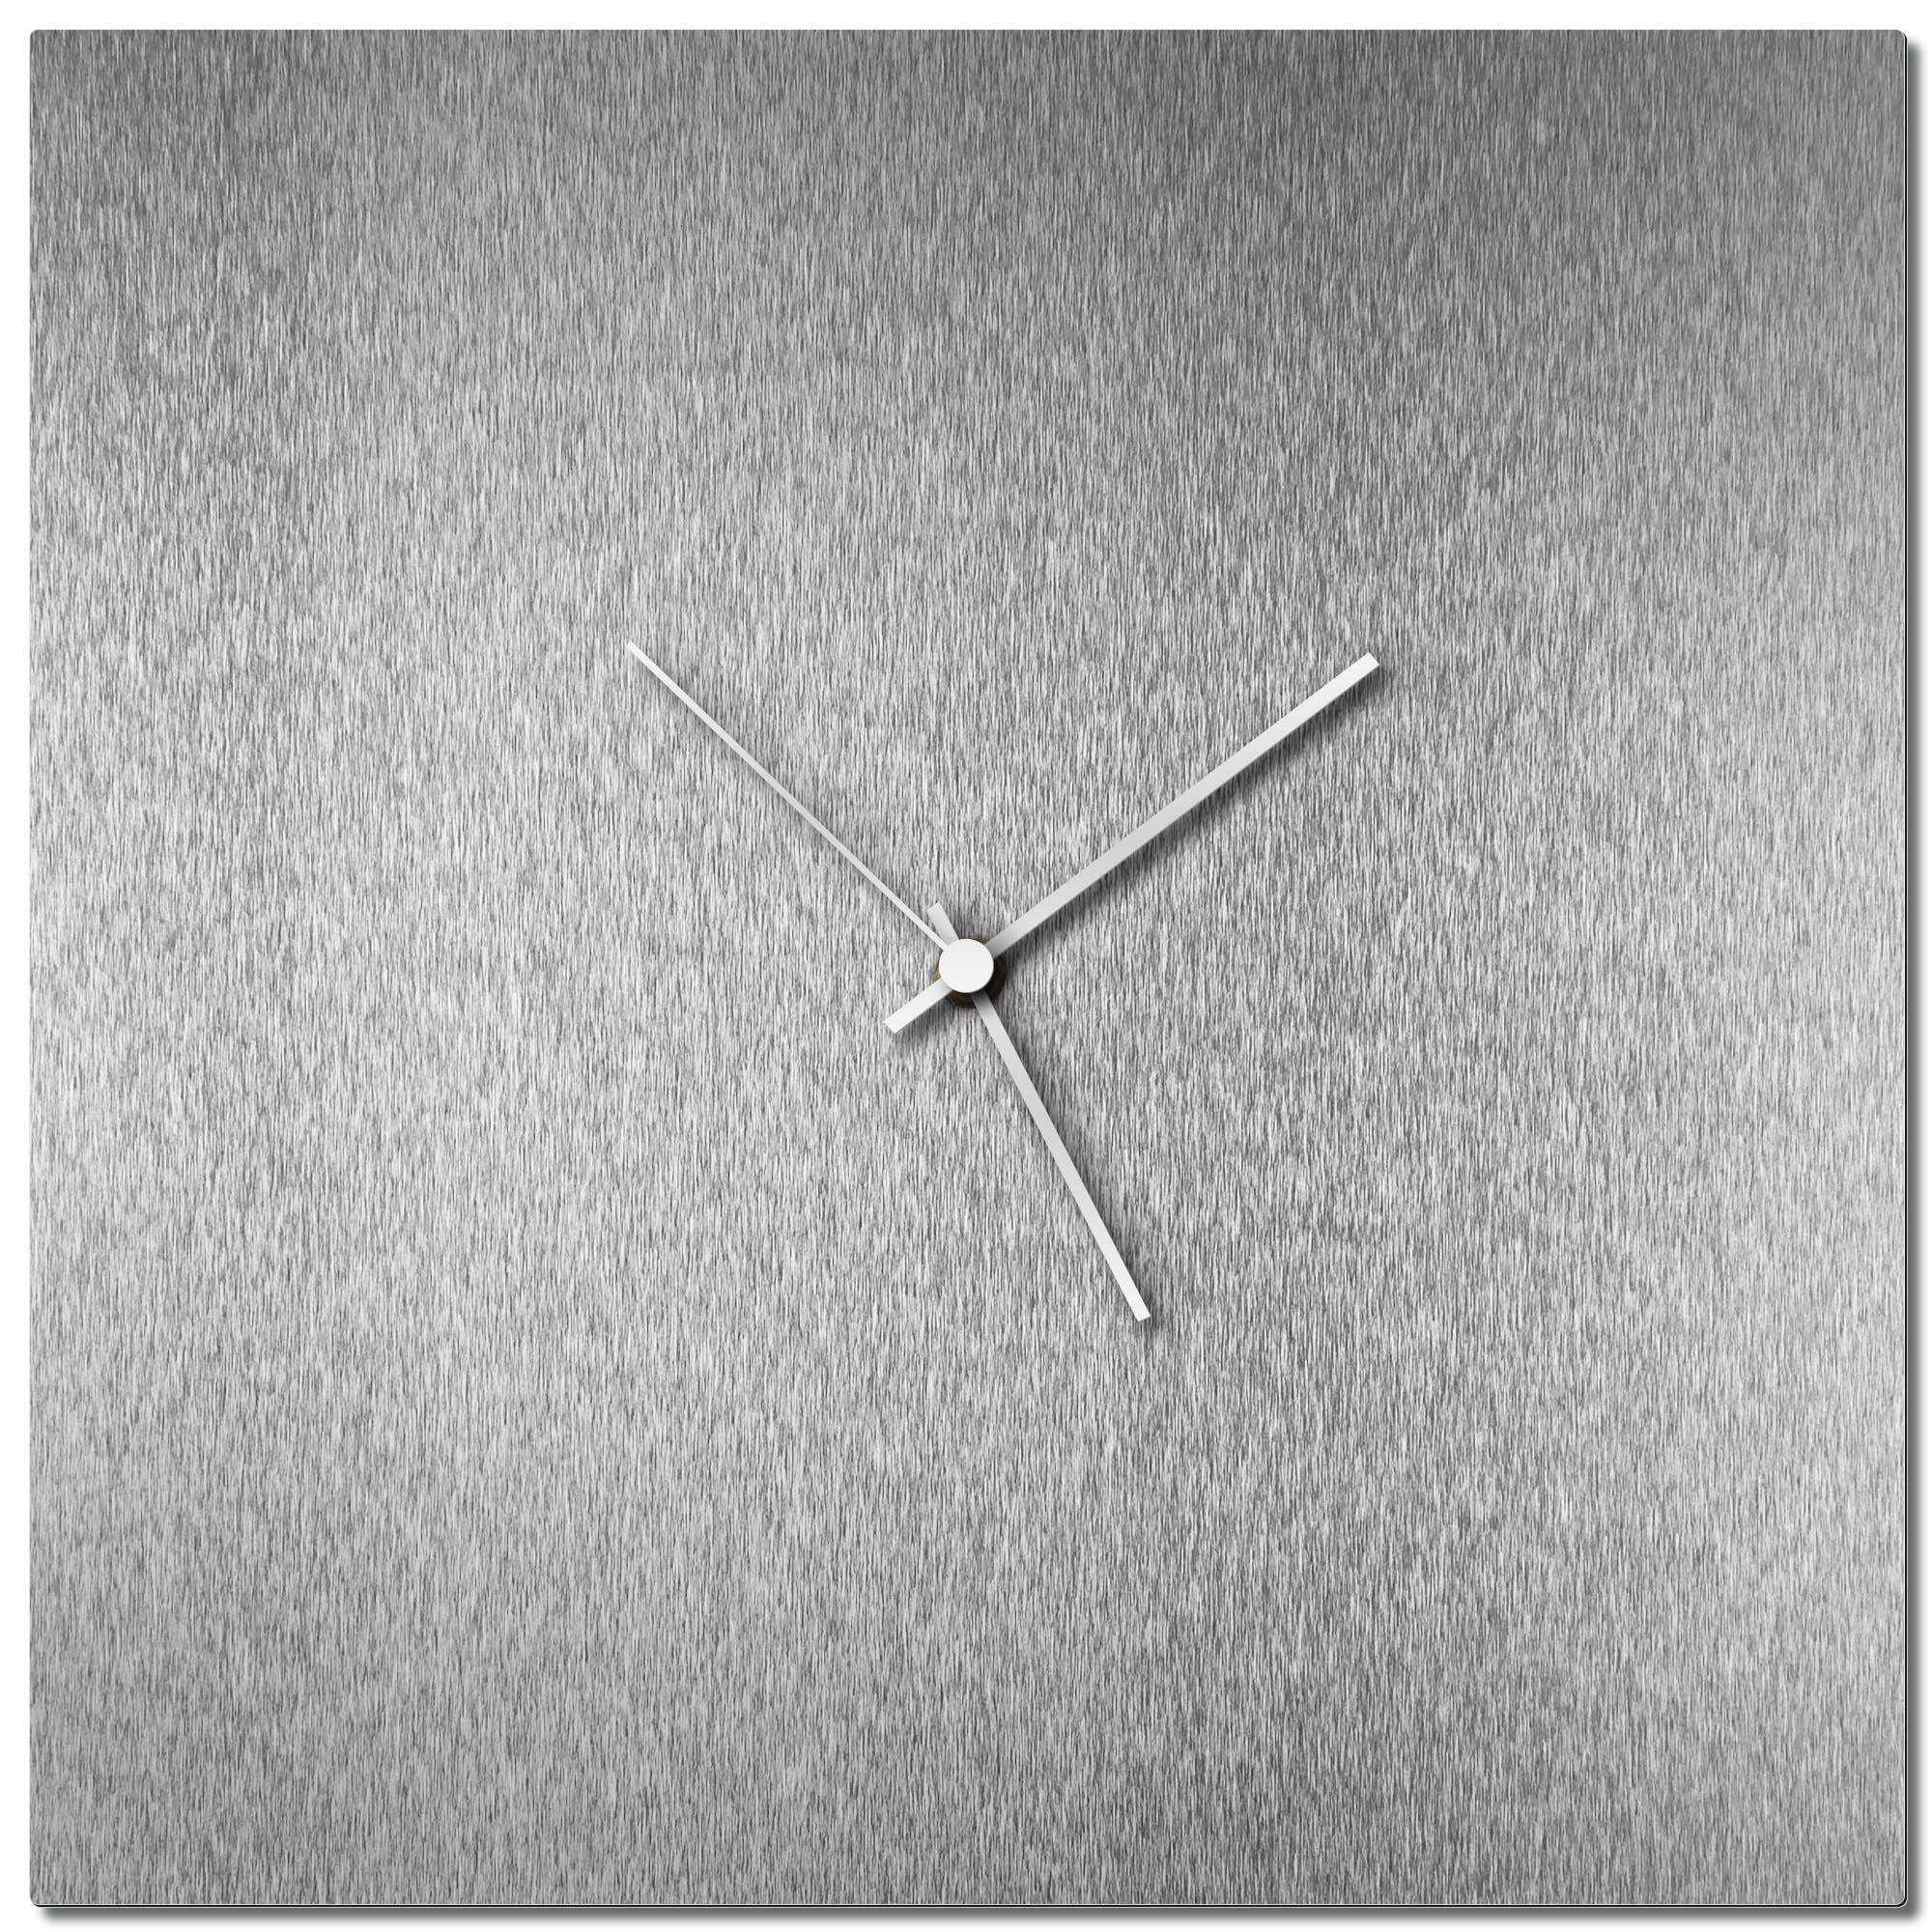 Adam Schwoeppe 'Silversmith Square Clock Large White' Midcentury Modern Style Wall Clock